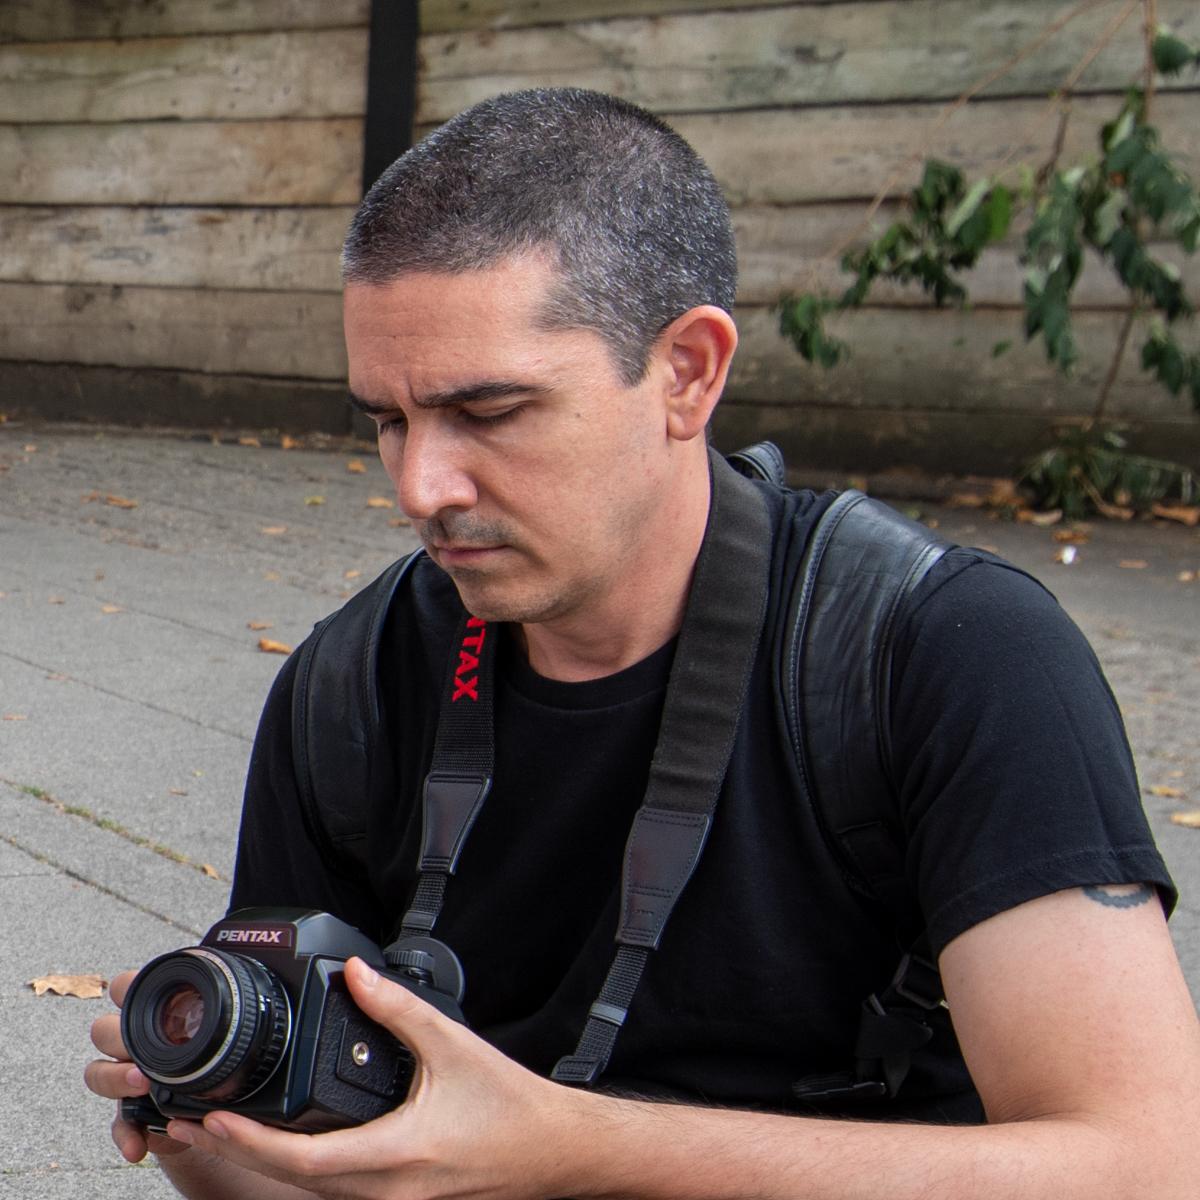 London-photographer-JC-Candanedo-Grey-Pistachio-Fashion-Corporate-Portraits-Headshots-Blog-Creative-Industry-London-a-better-world.jpg